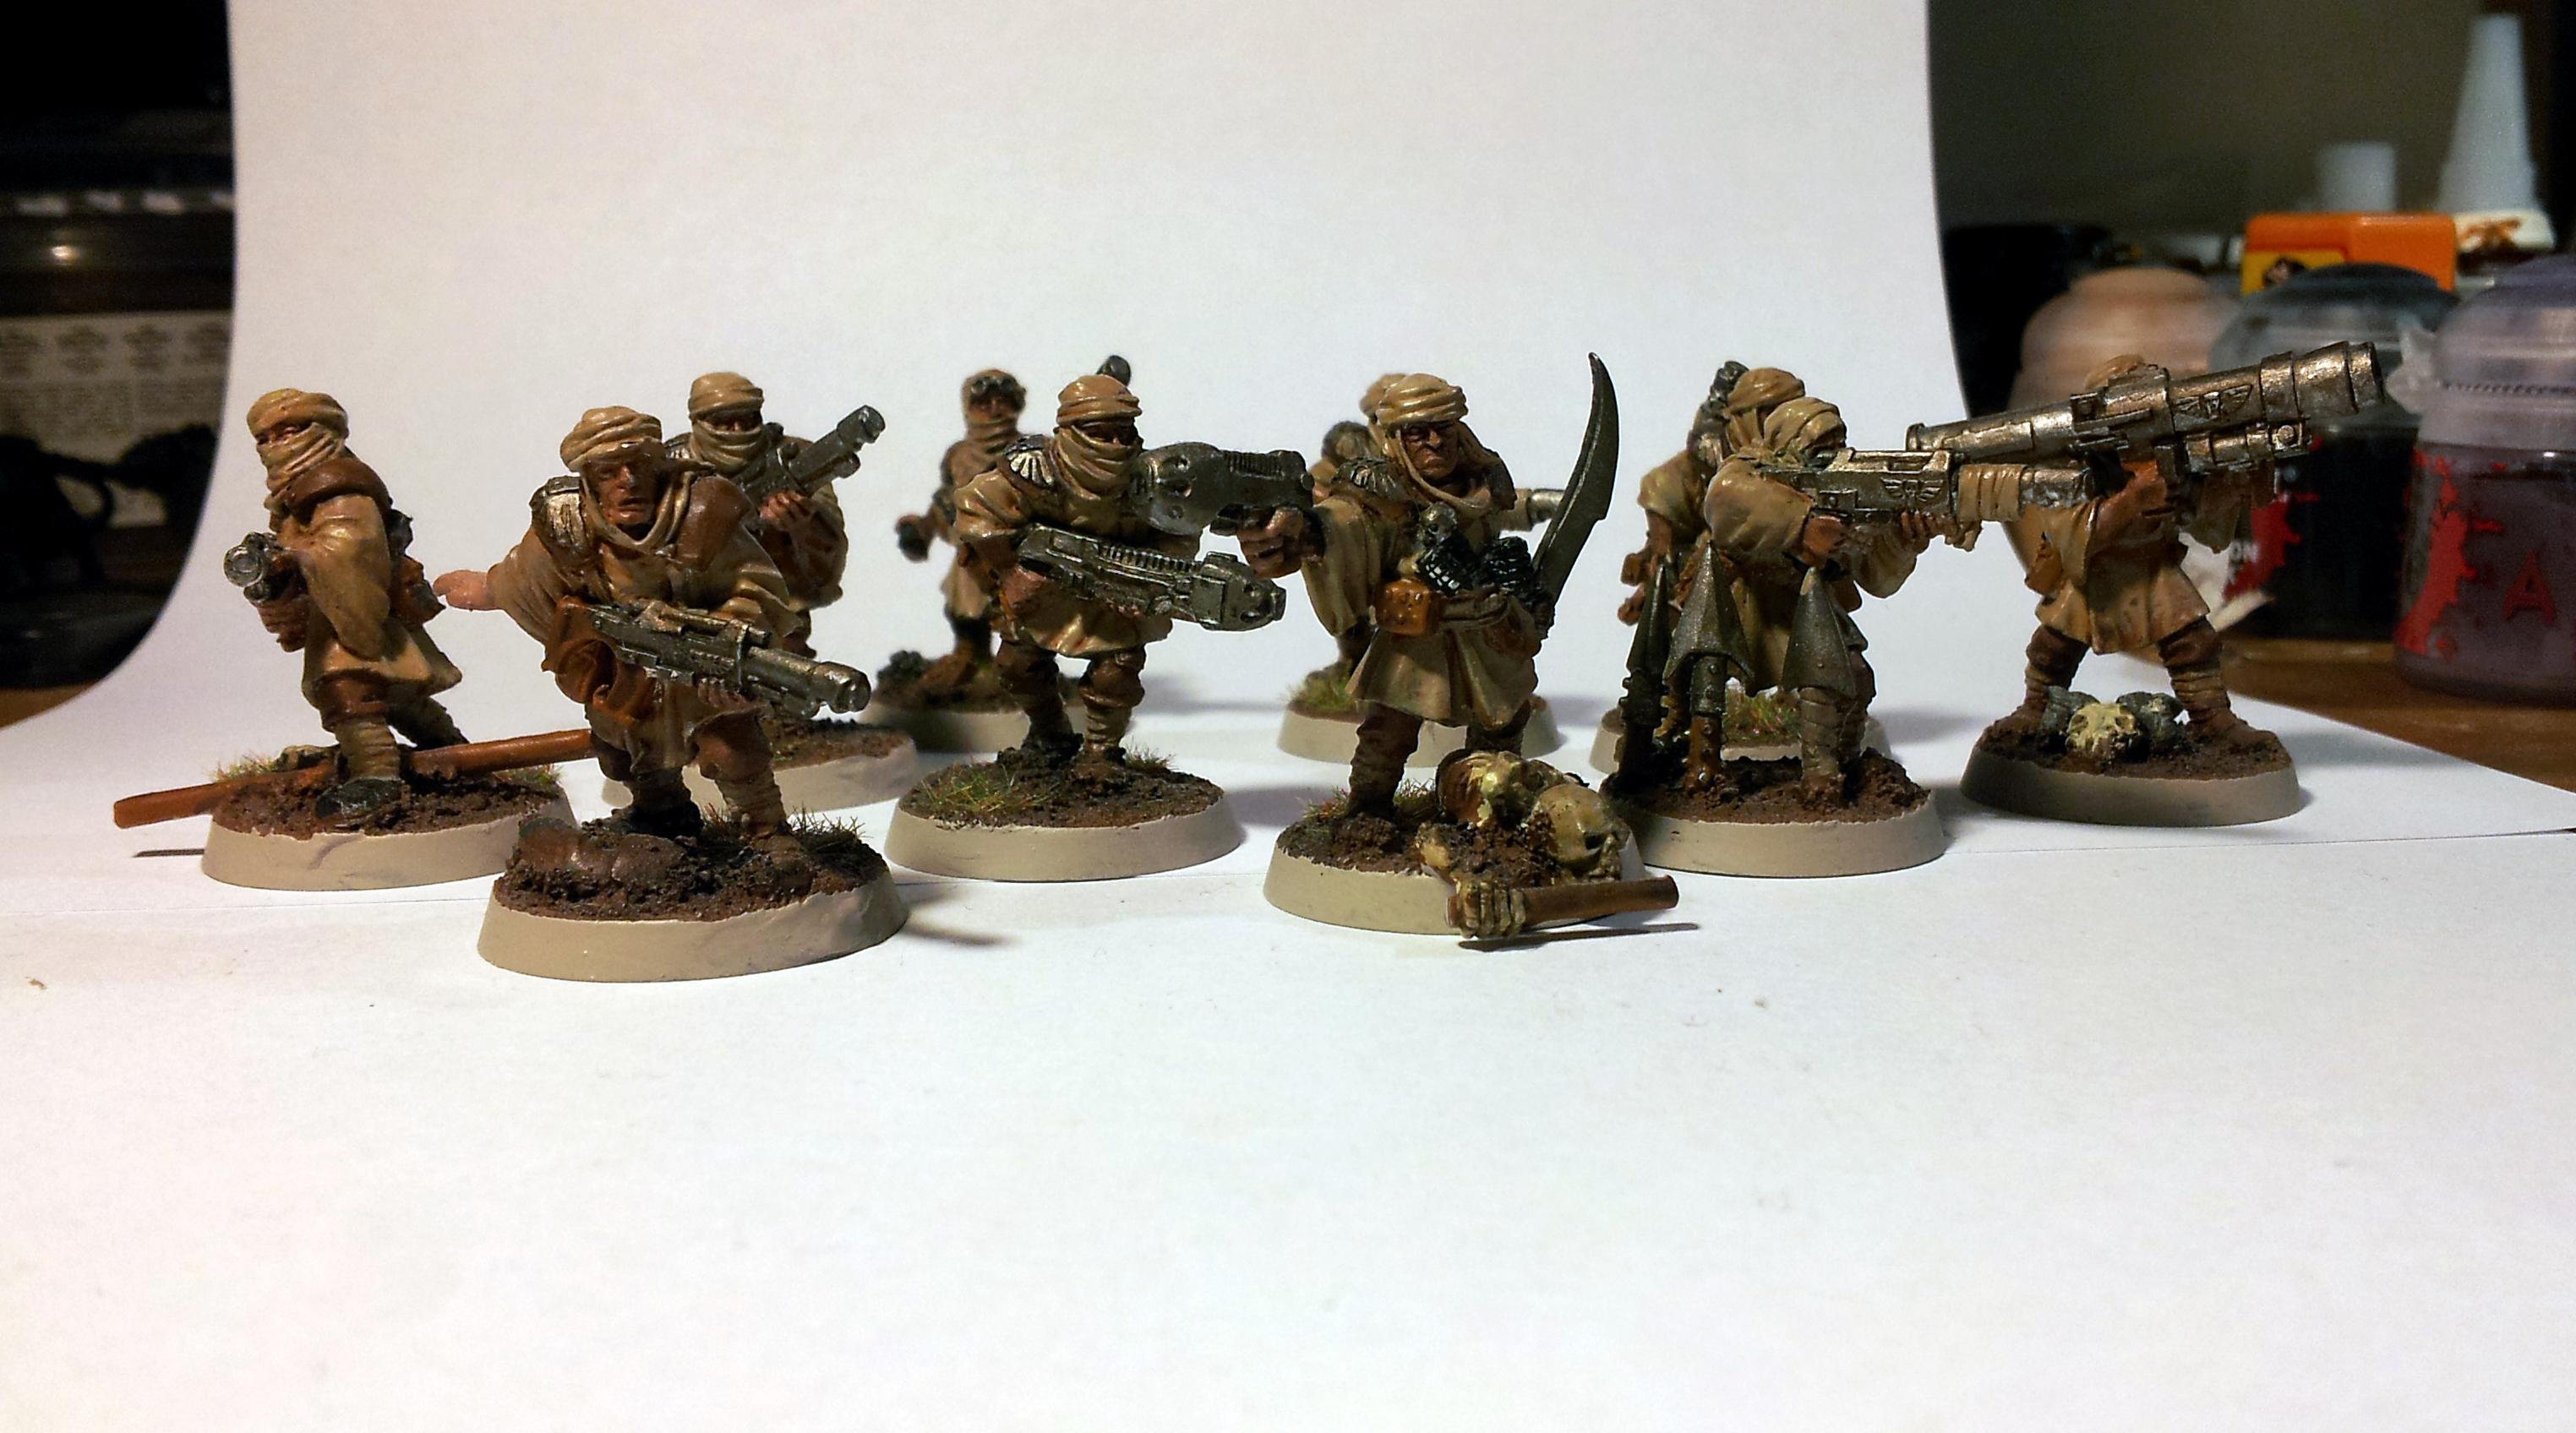 Guards, Imperial Guards, Tallarn Desert Raiders